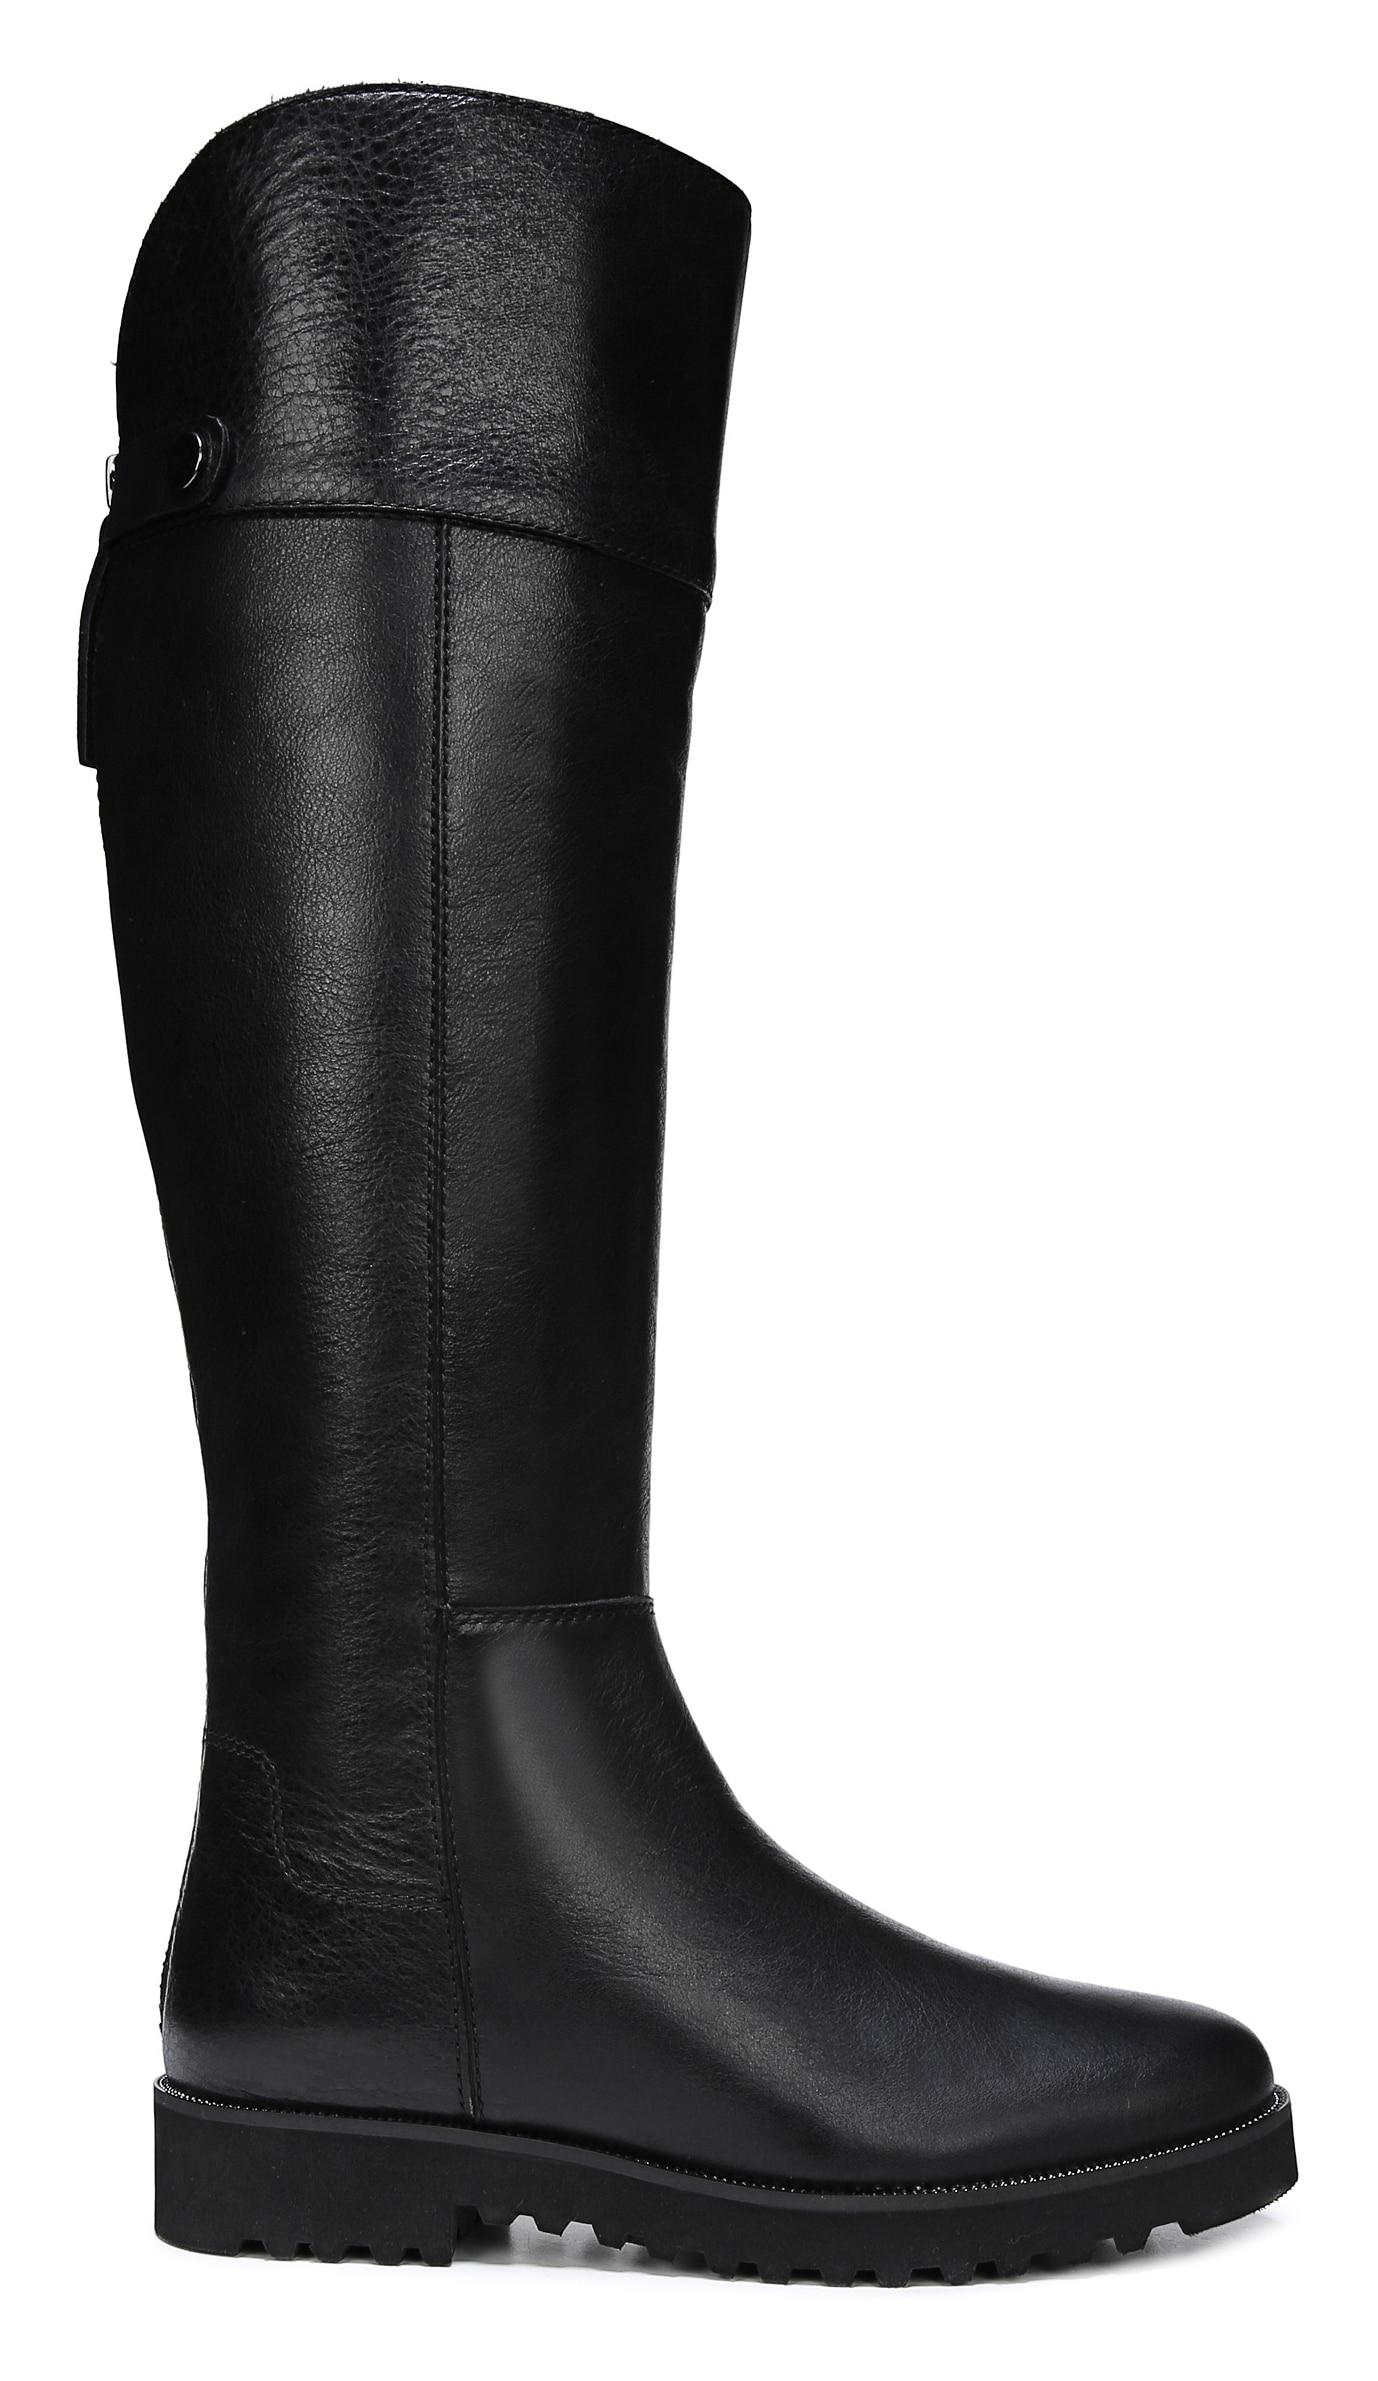 039a709a2c06 Image product price franco sarto cosmina jpg 950x903 Franco sarto rubber  soles